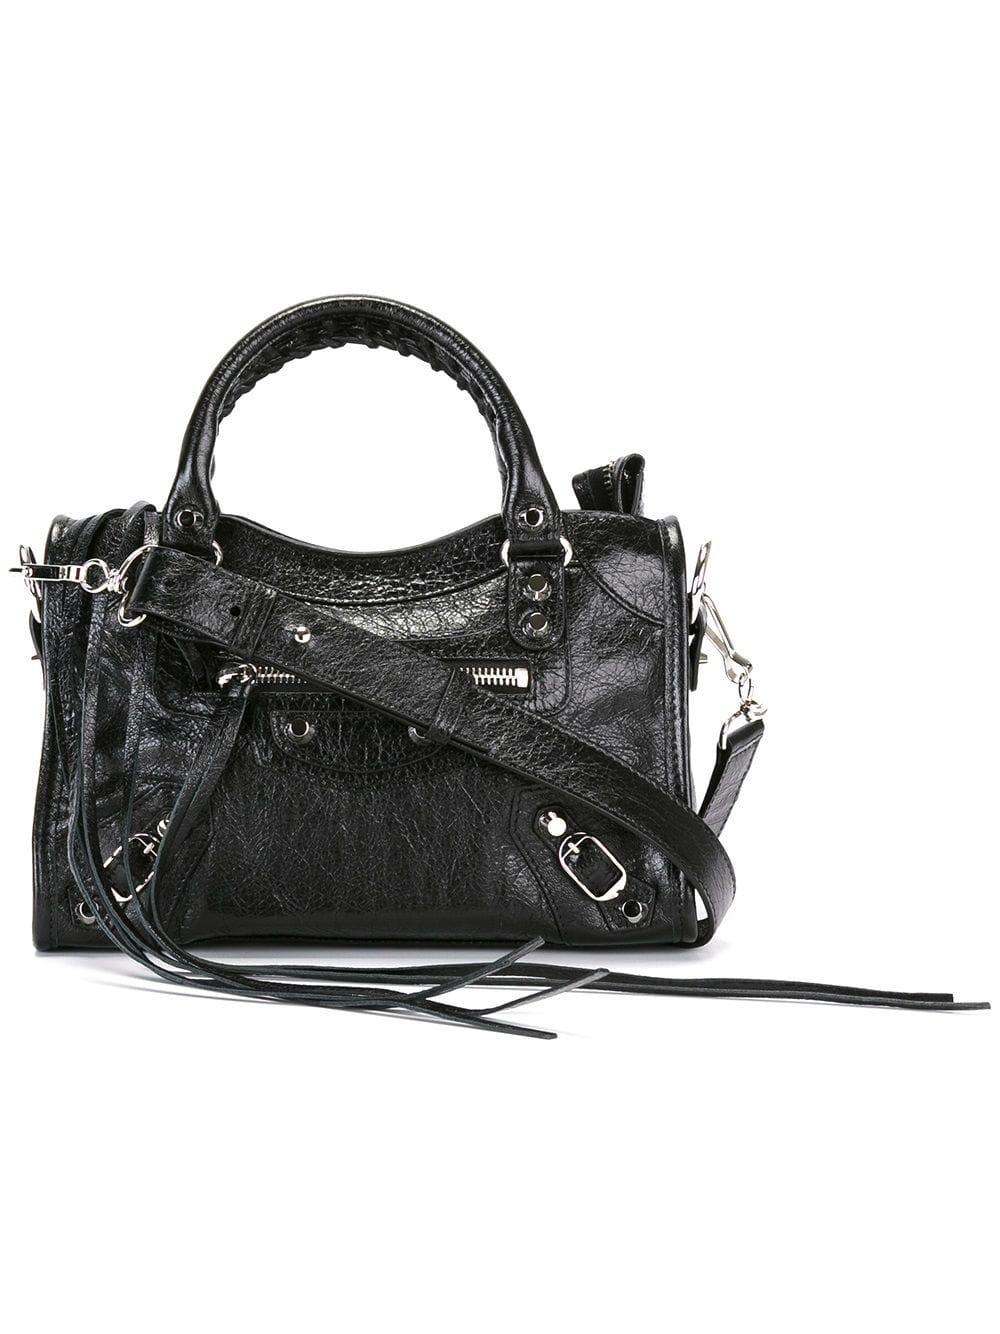 City Mini Leather Handbag